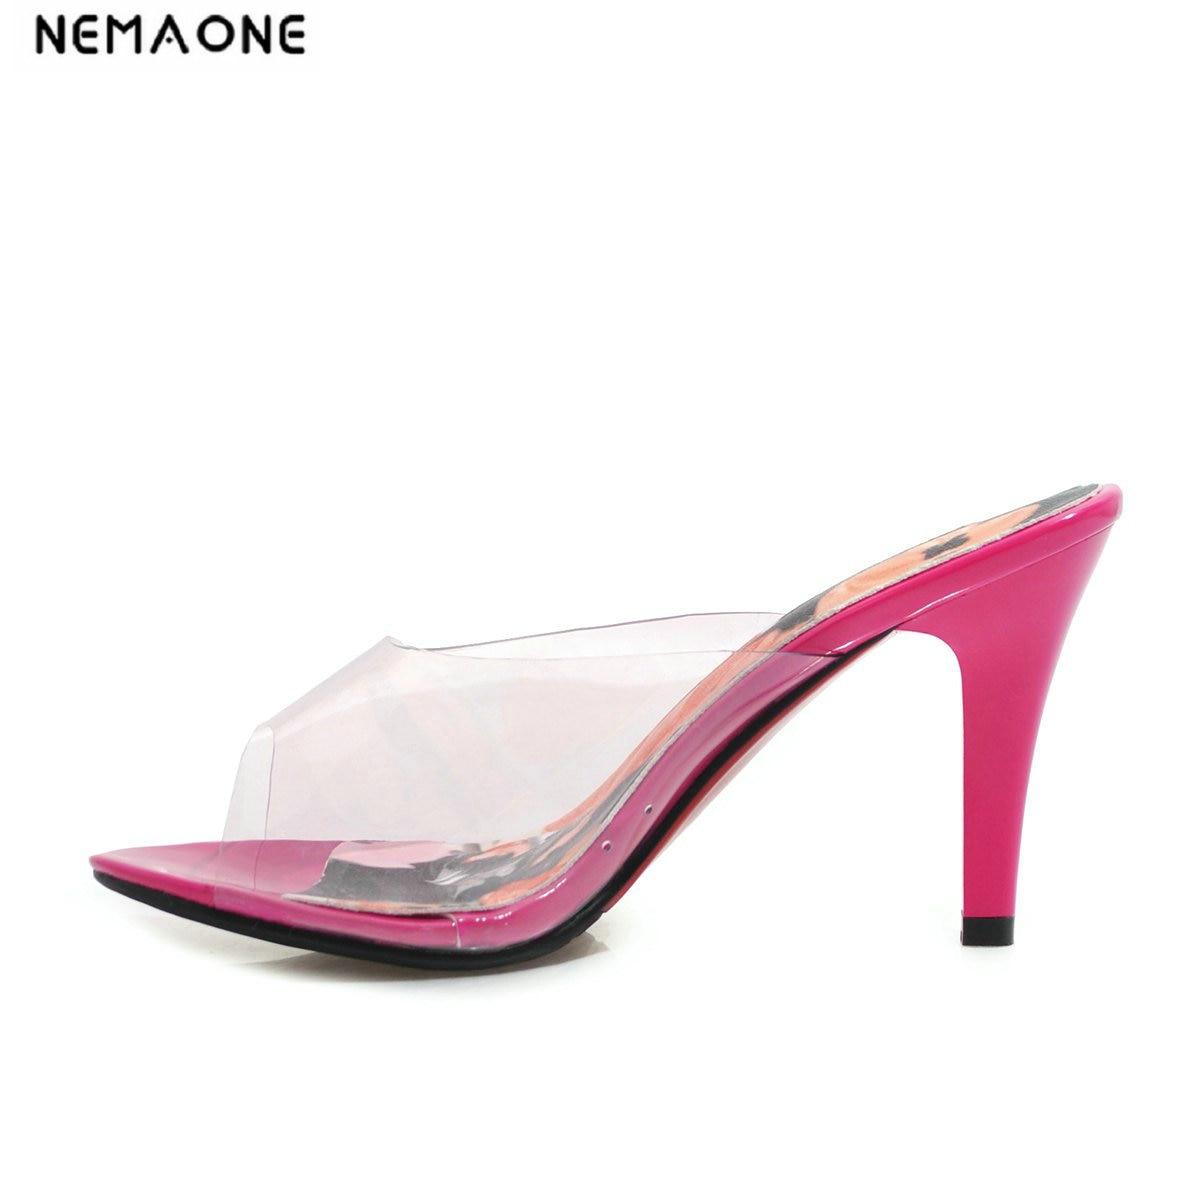 NEMAONE 2019 summer high heels 8cm stilettos clear pvc peep toe fashion slippers slides big size mules ladies sandals 46